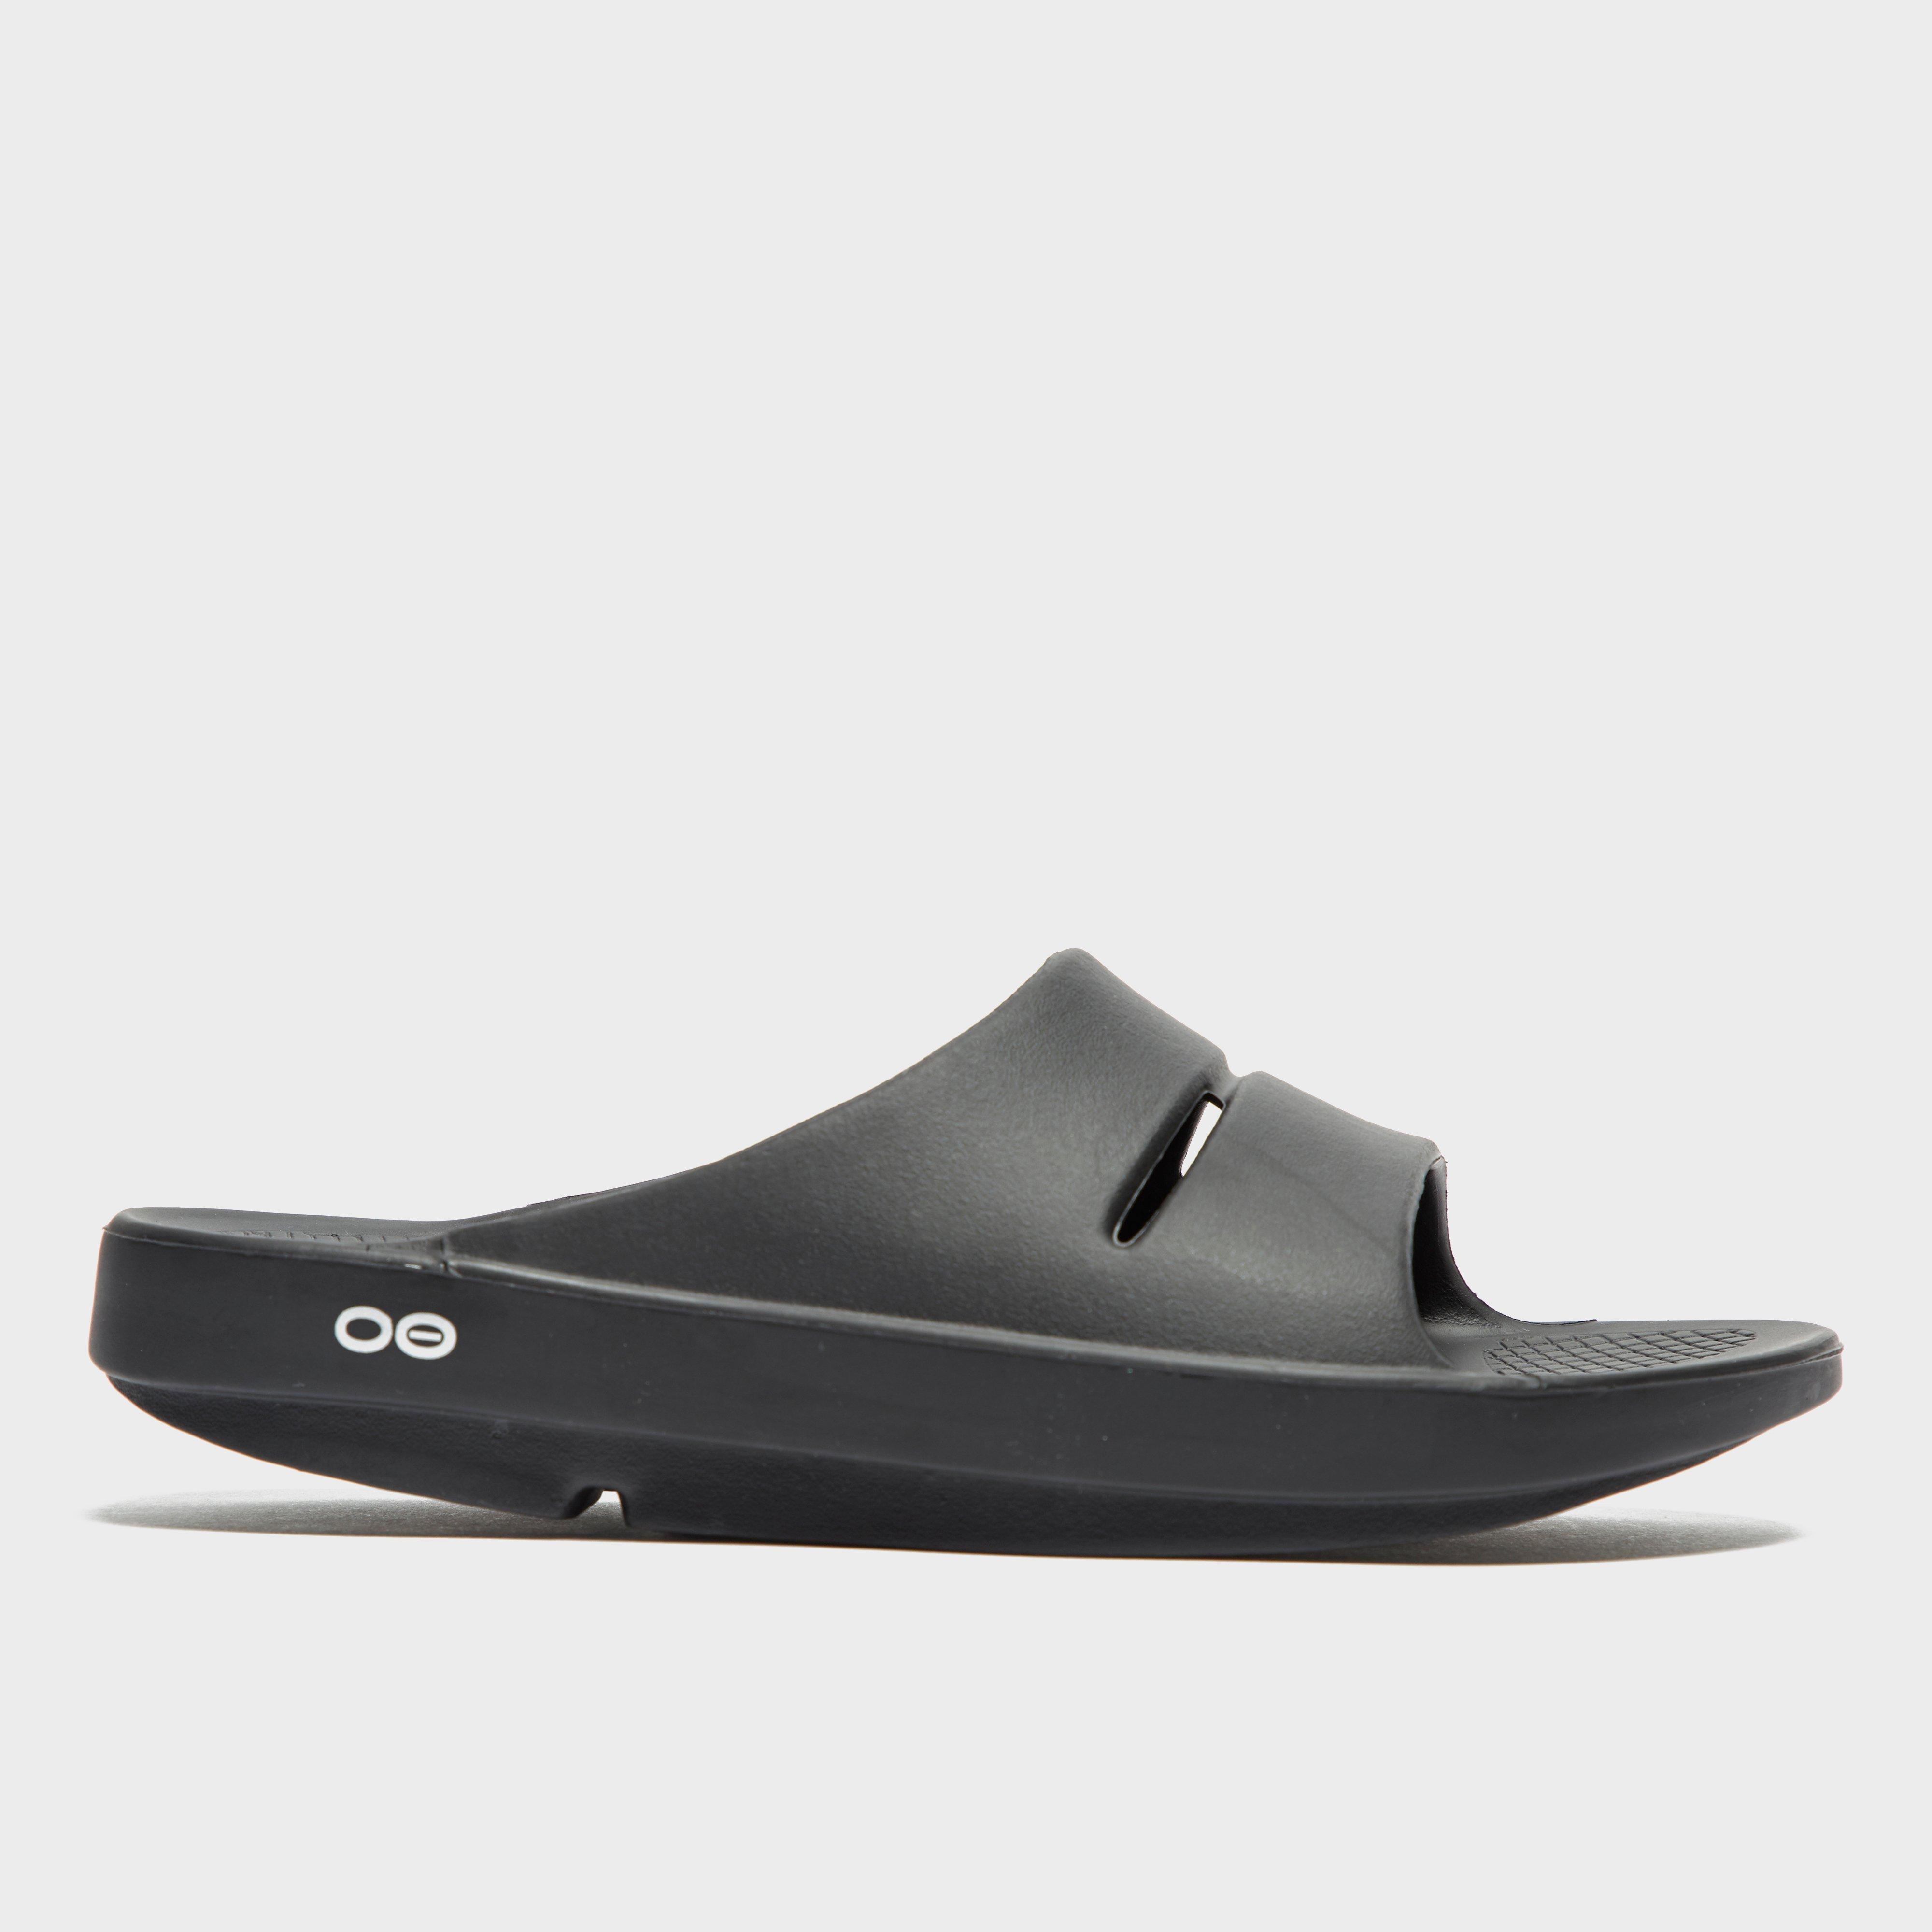 Oofos Oofos Womens OOahh Slides - Black, Black